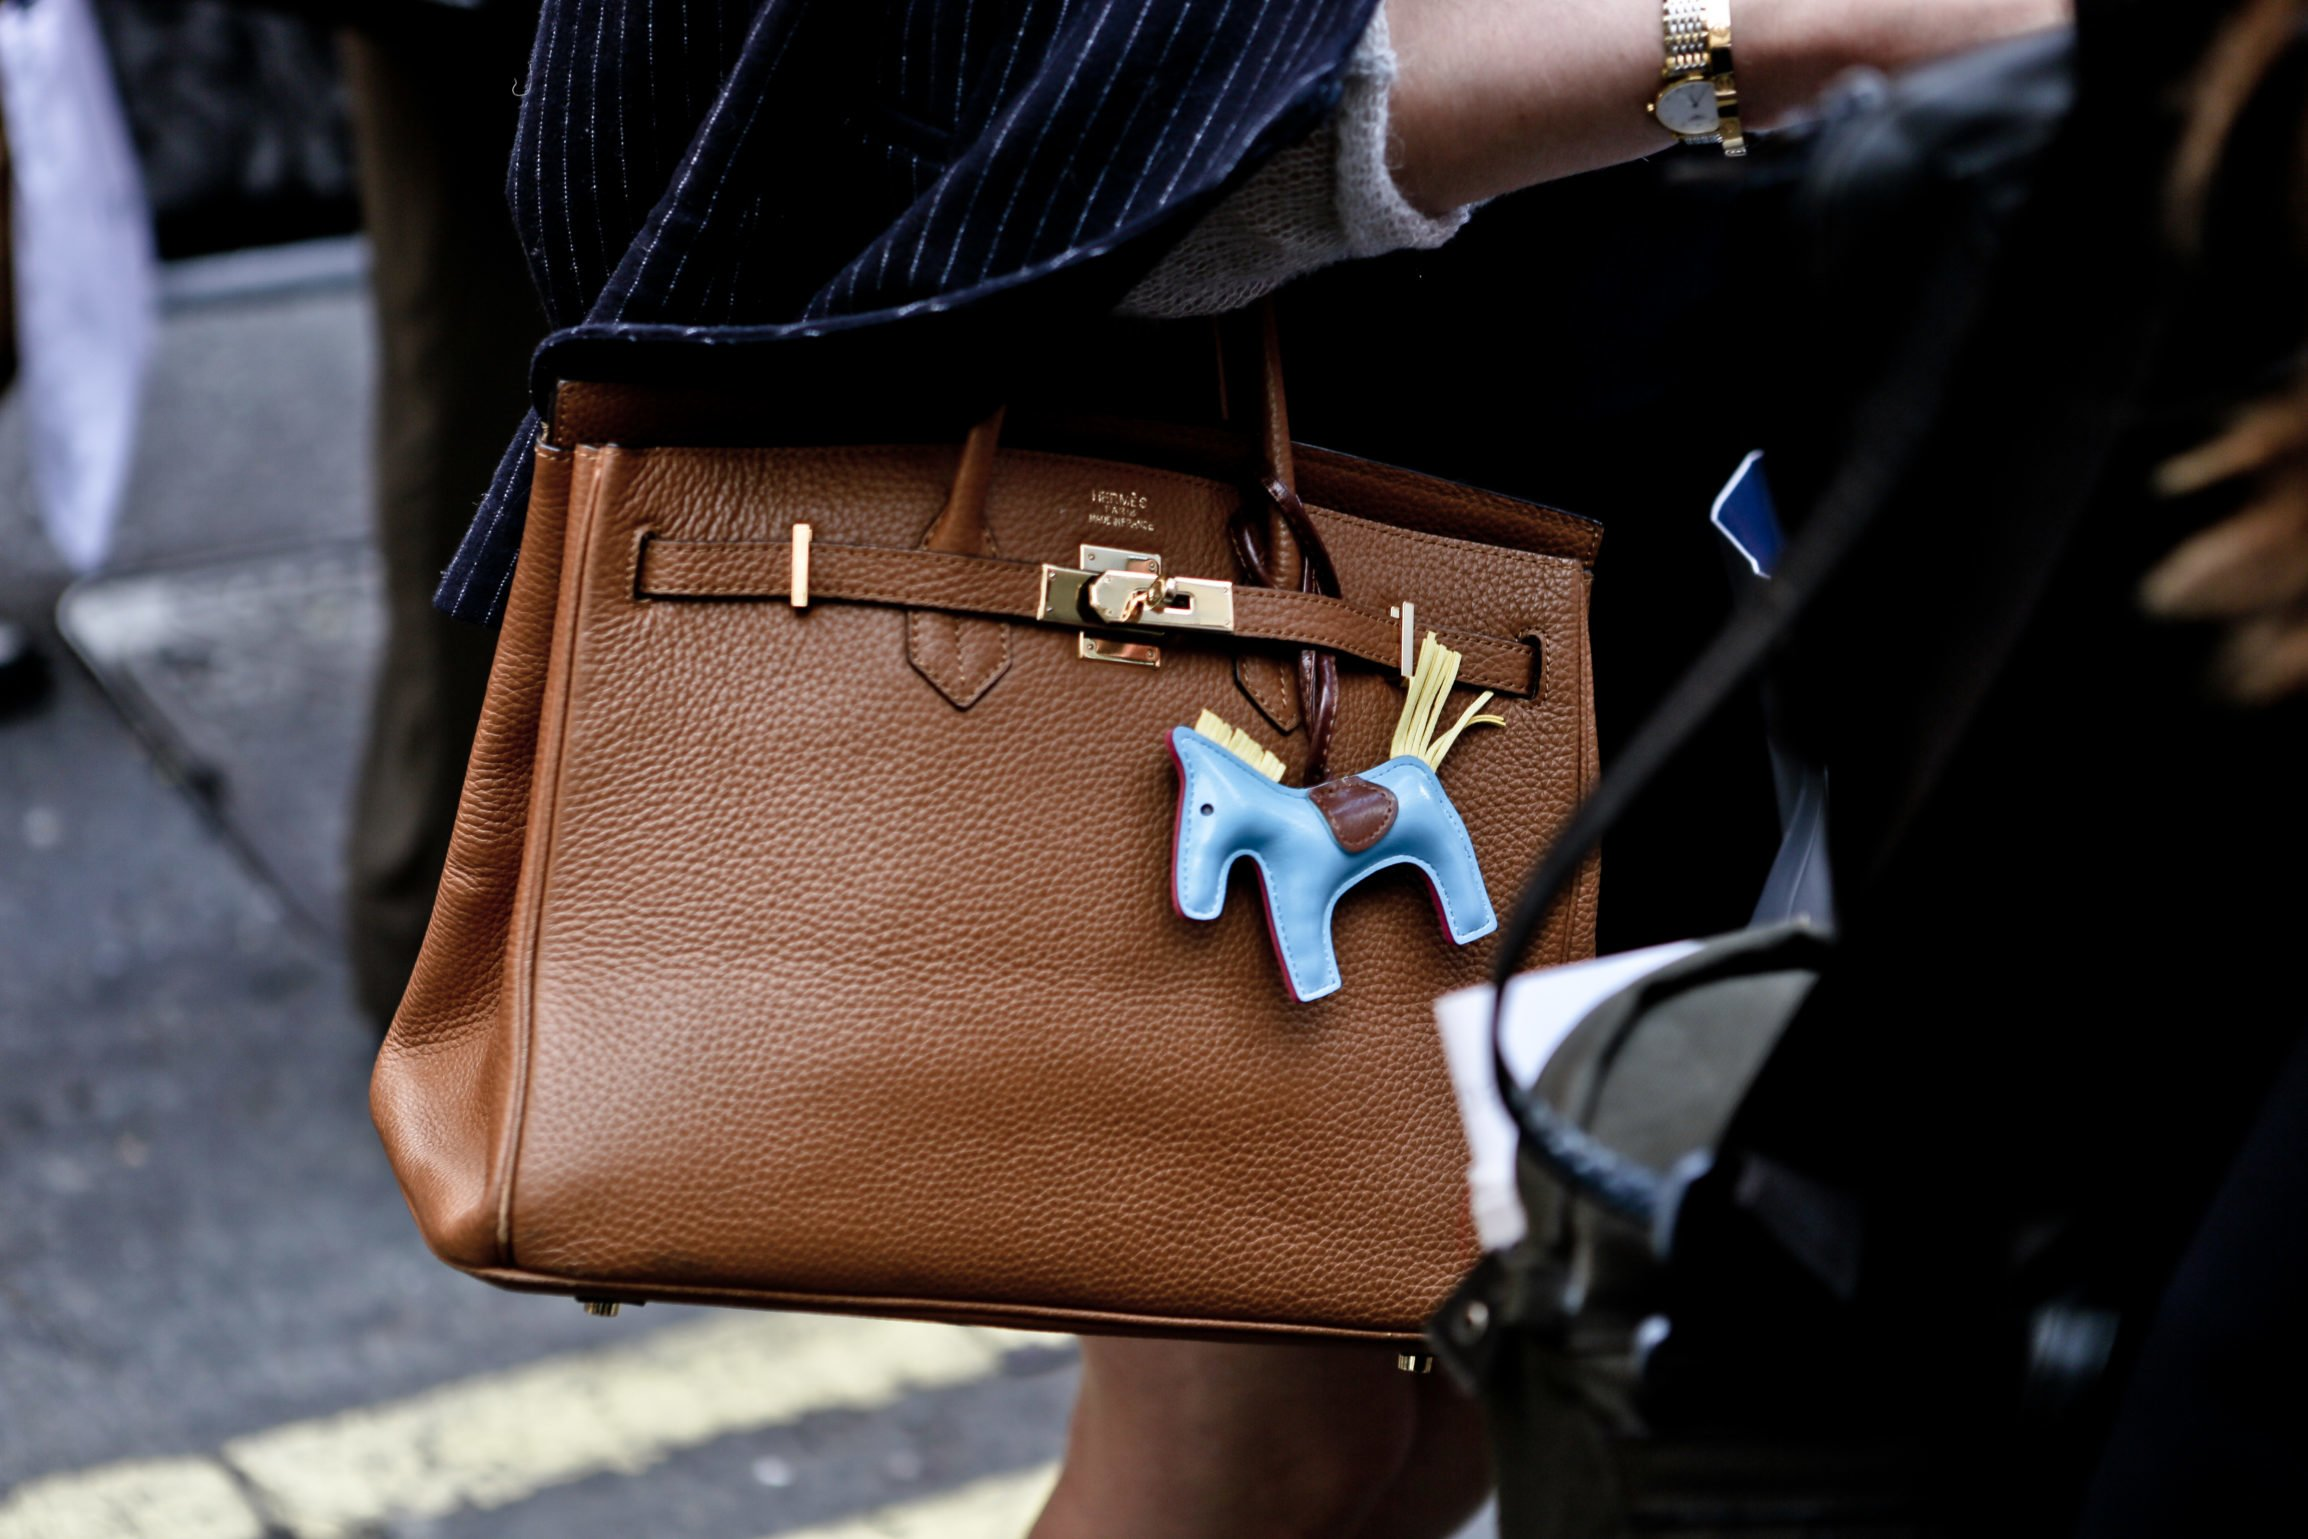 96b8be1f9ca7 Определяем подлинность сумки Hermès Birkin - OSKELLY